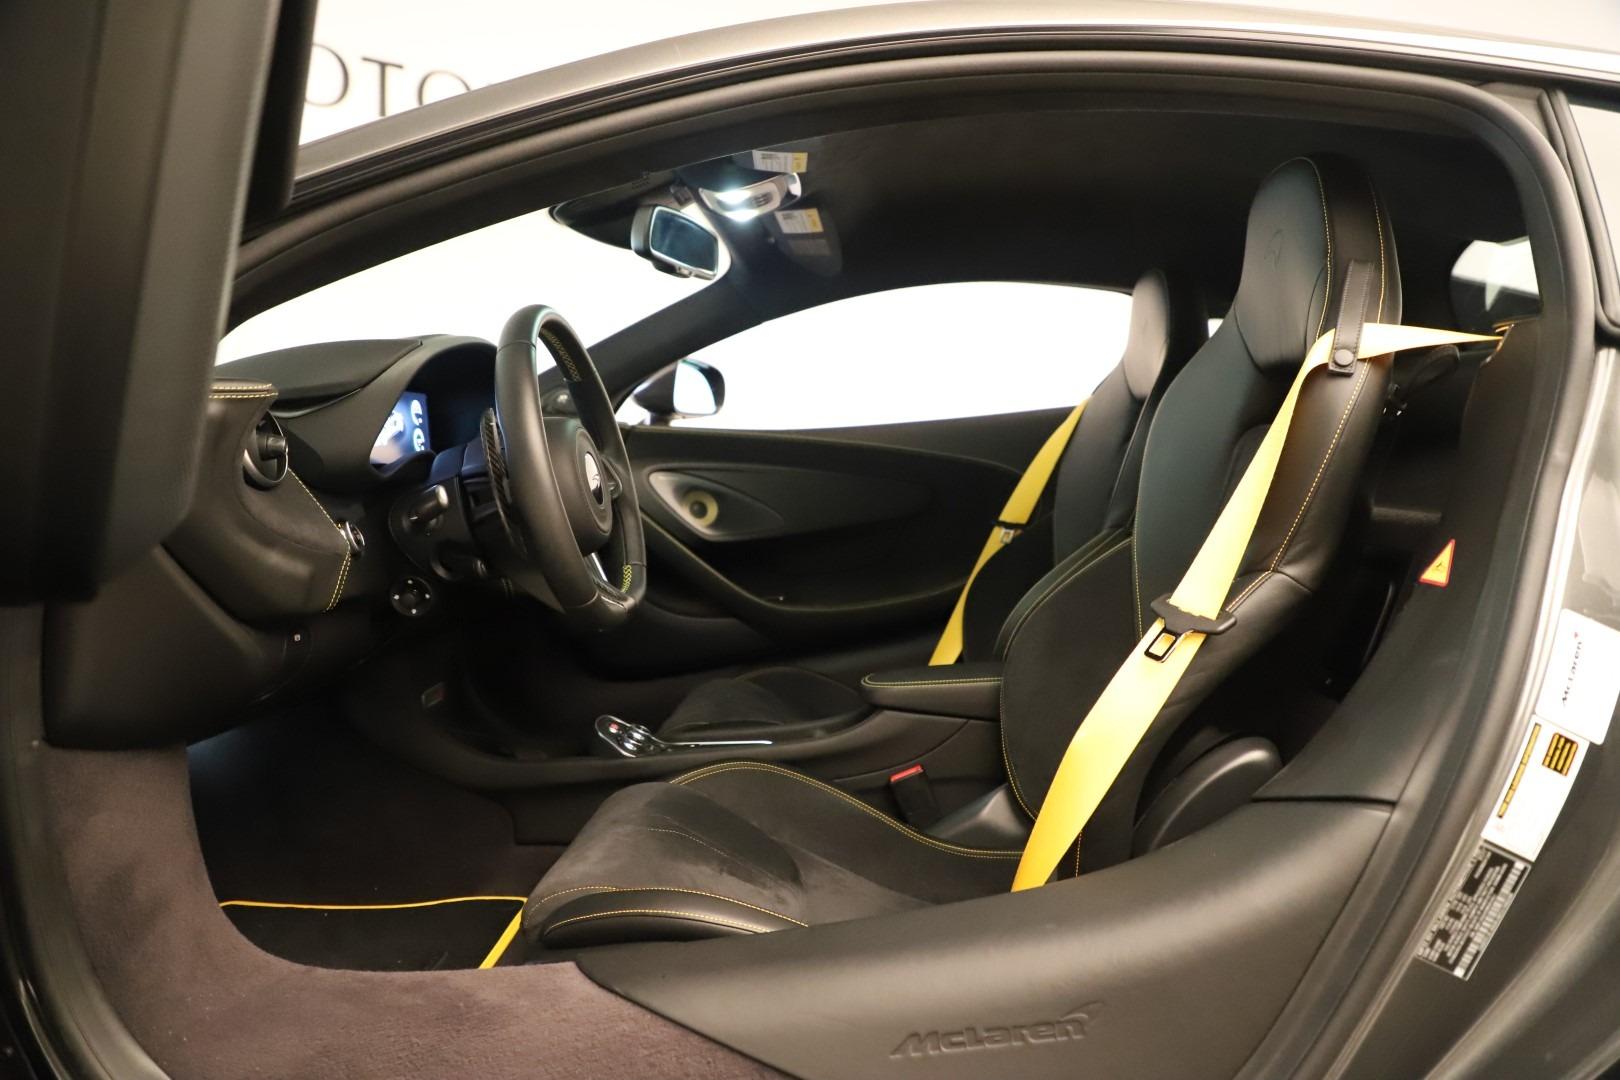 Used 2017 McLaren 570S Coupe For Sale In Westport, CT 3361_p15